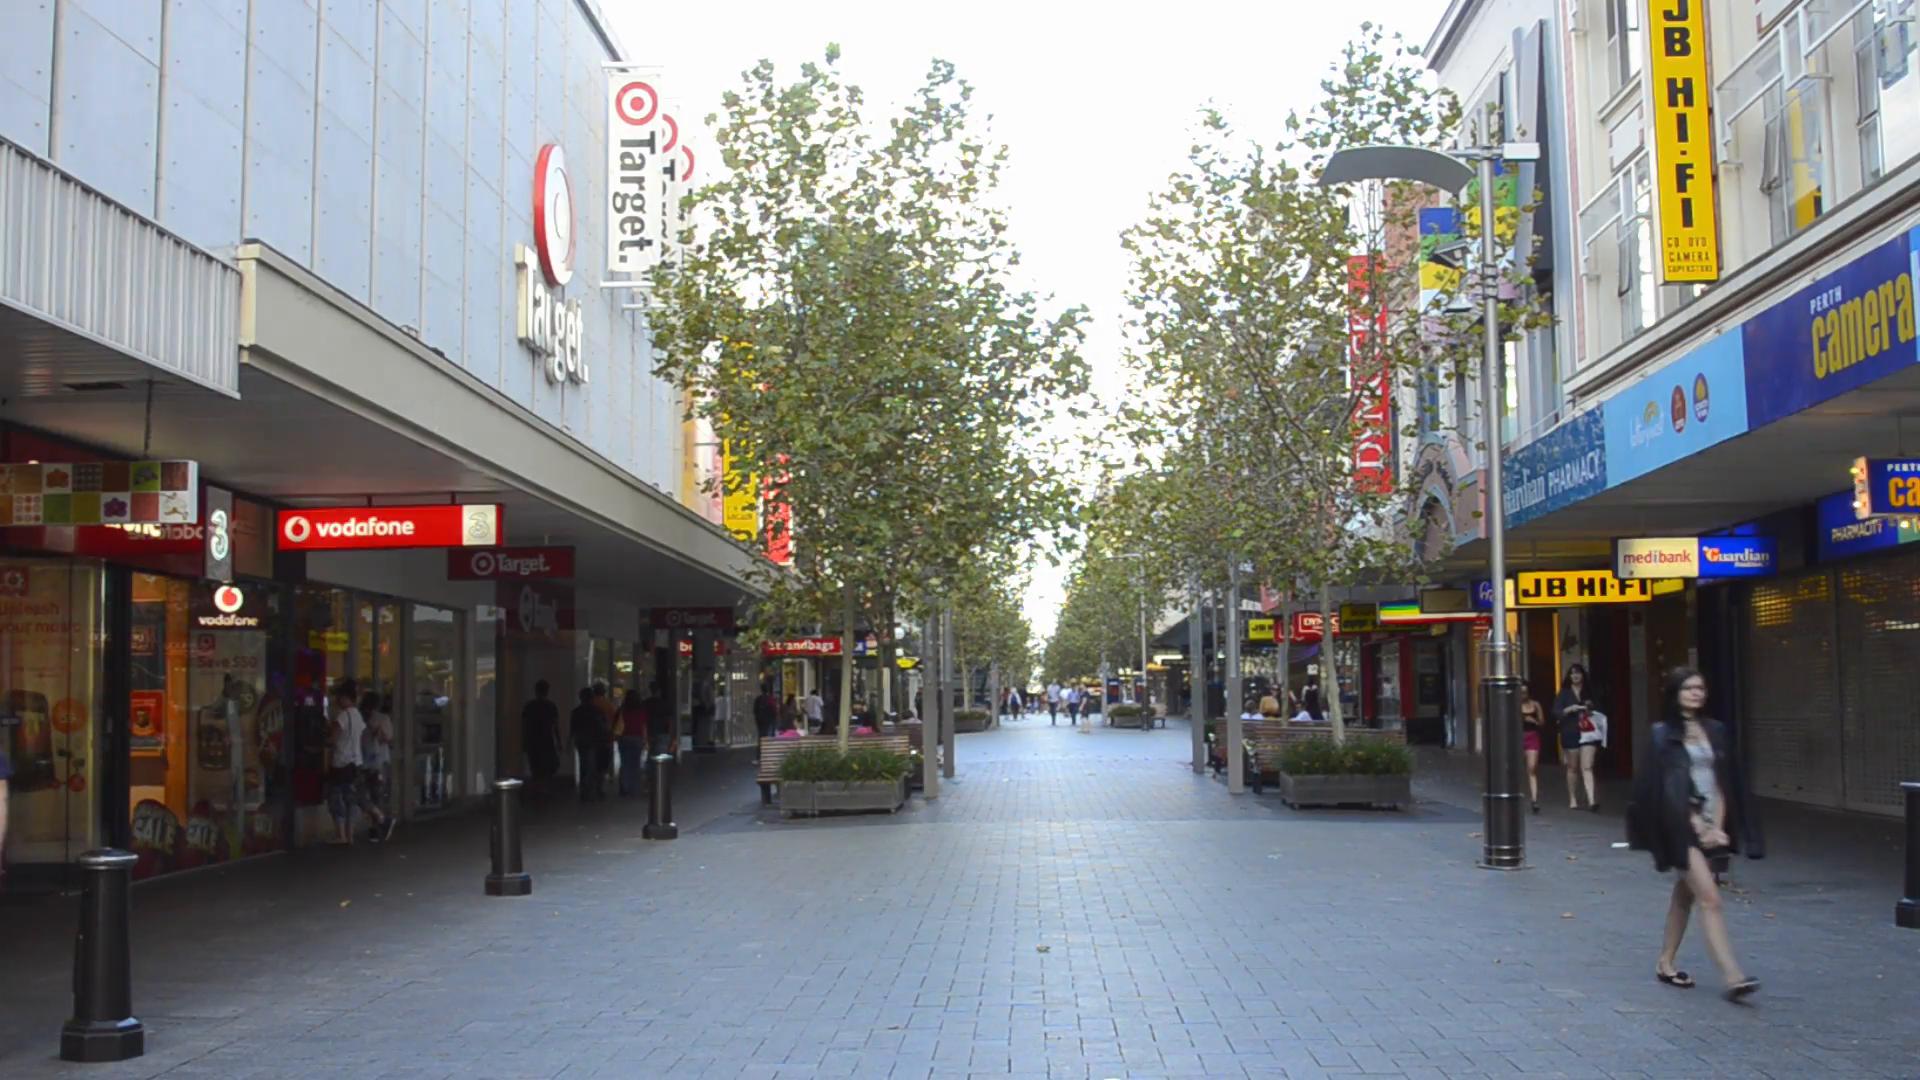 perth-australia-the-walking-street-with-murray-street-at-the-hay-street-mall-in-western-australia_eyzo6sjn__F0000.png